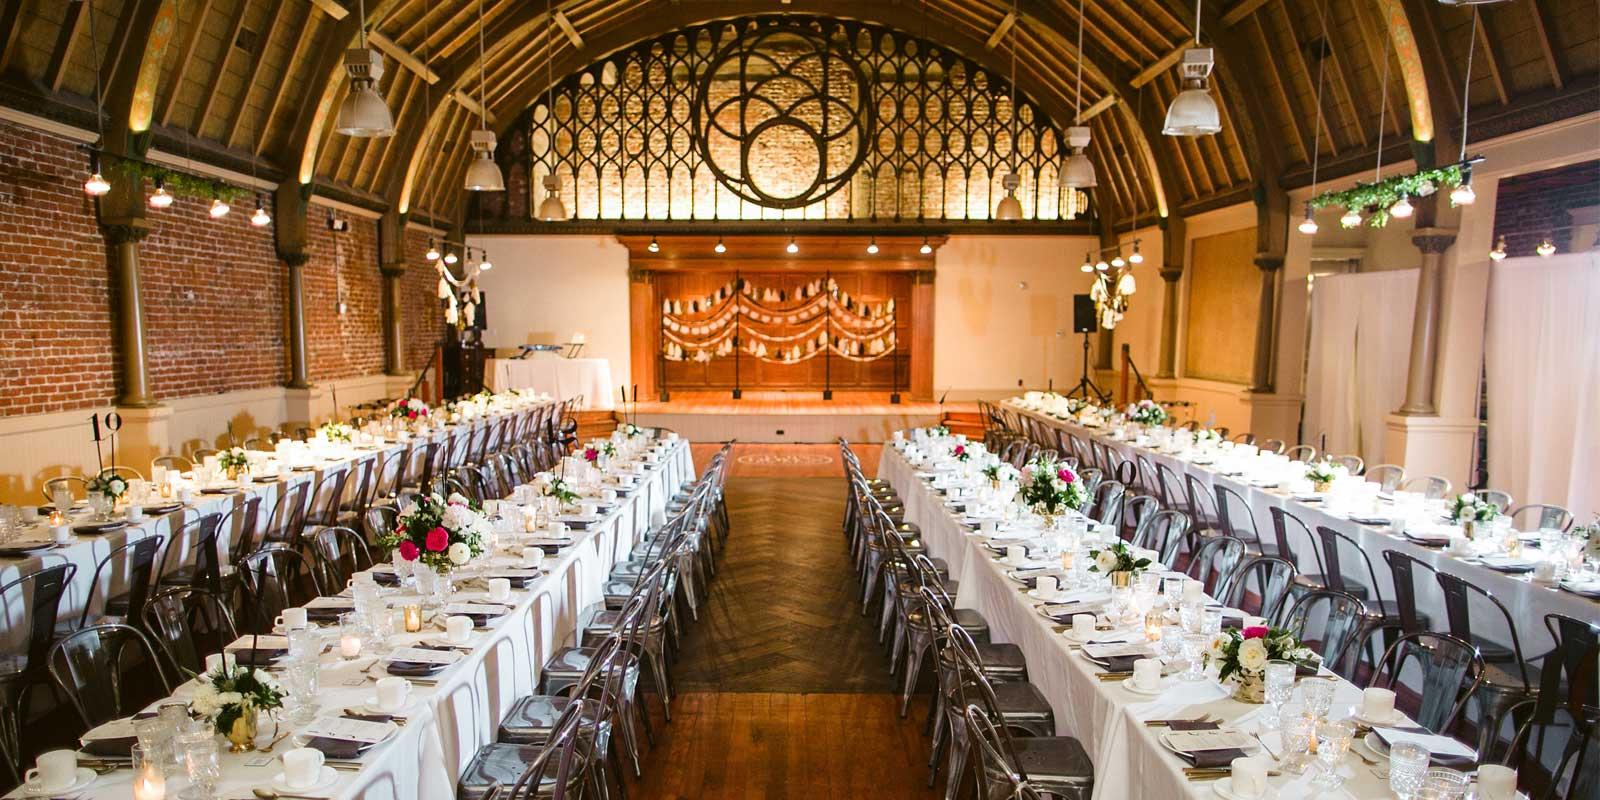 bakerpartyrentals wedding decoration rentals Baker Party Rentals